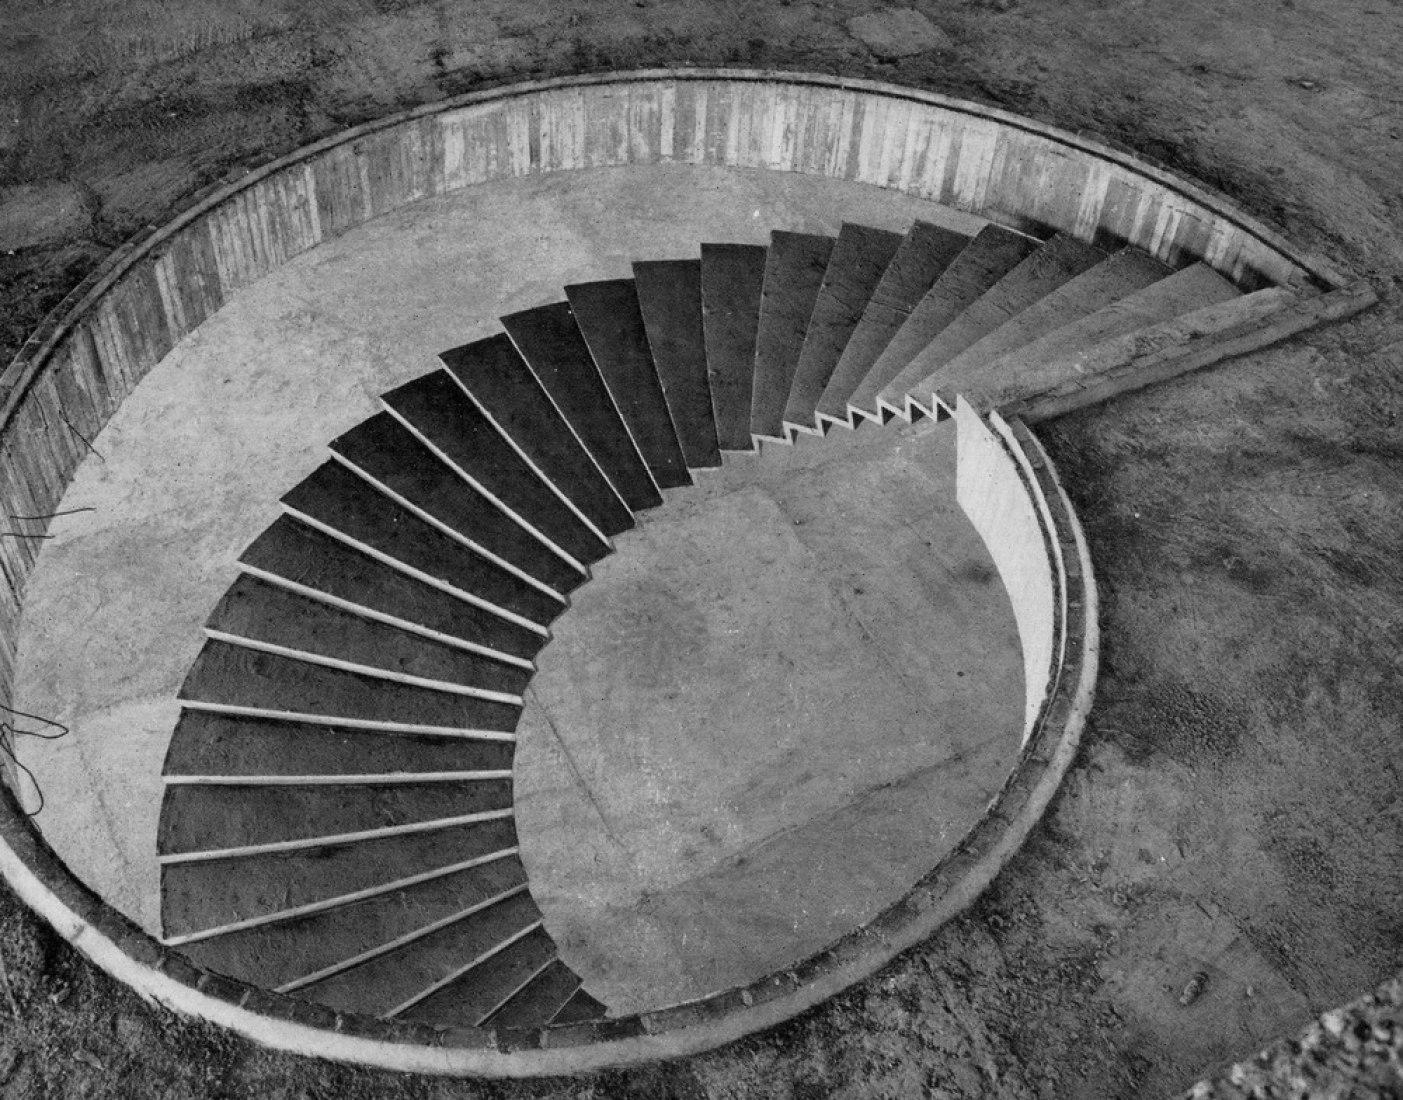 Museo de Arte Moderno en construcción por Affonso Eduardo Reidy. Fotografía © Reto Halme